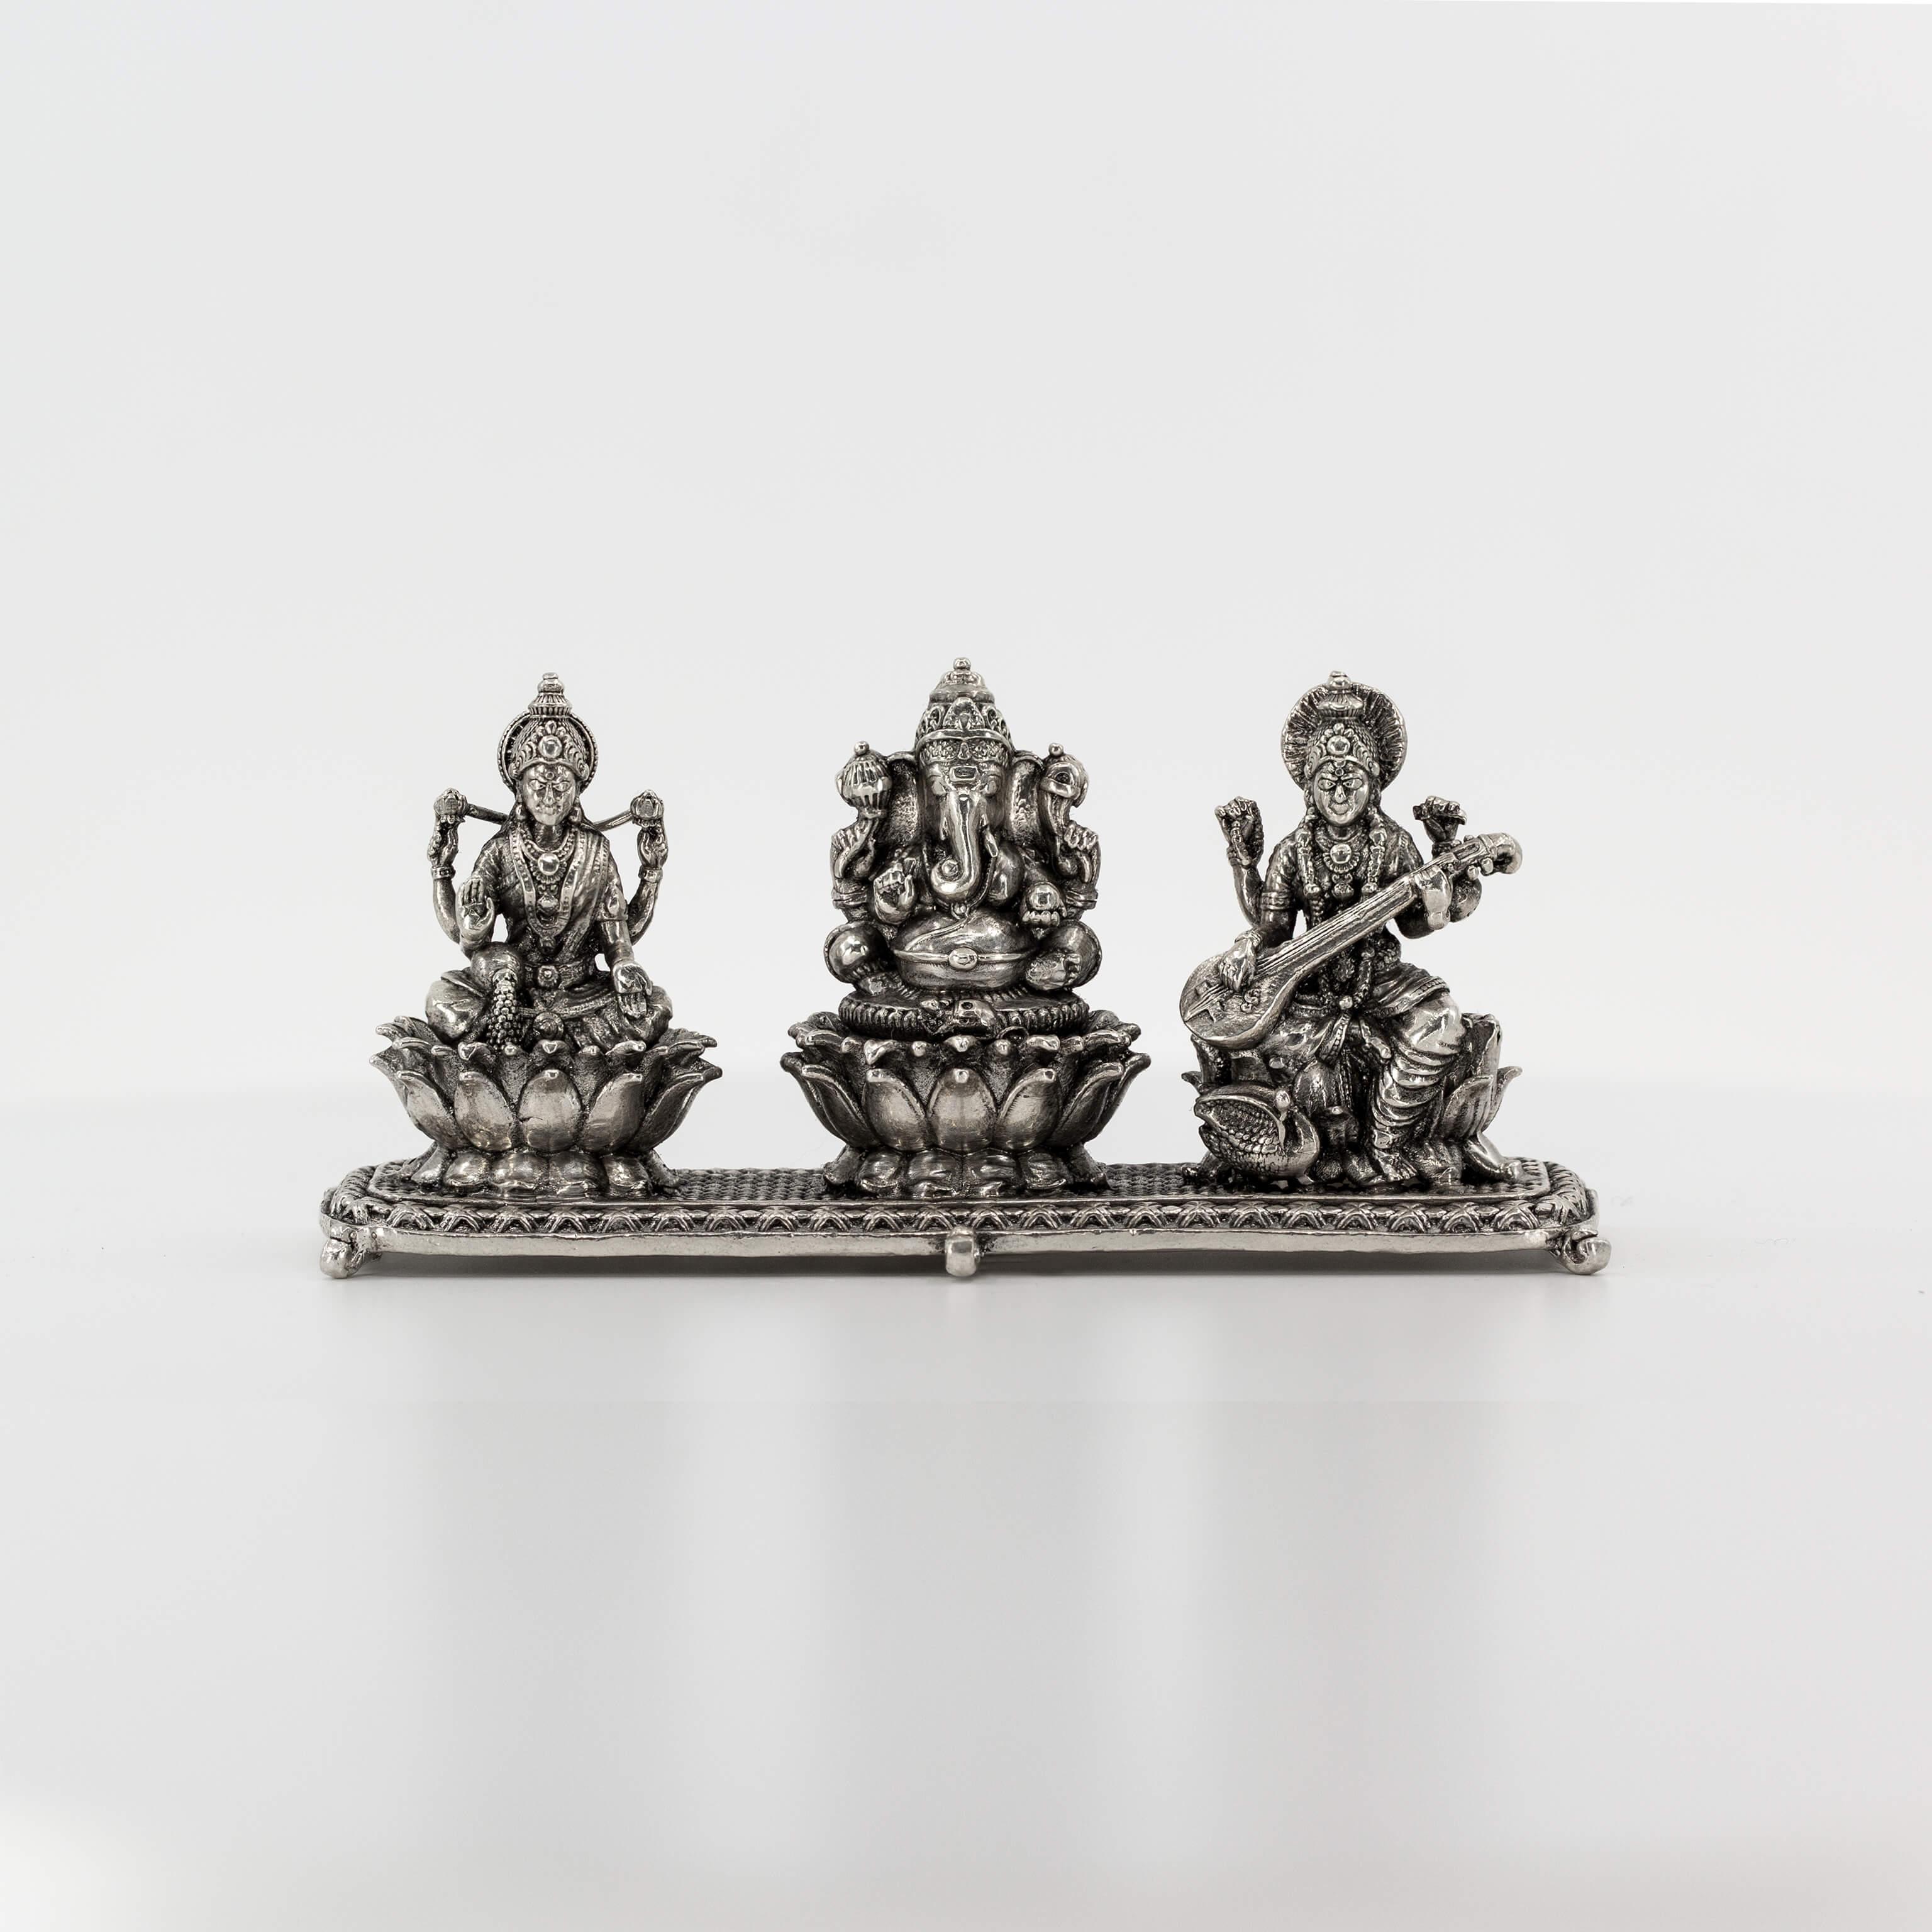 Statue - 3D - Oxidised - Lakshmi Ganesha Saraswathi